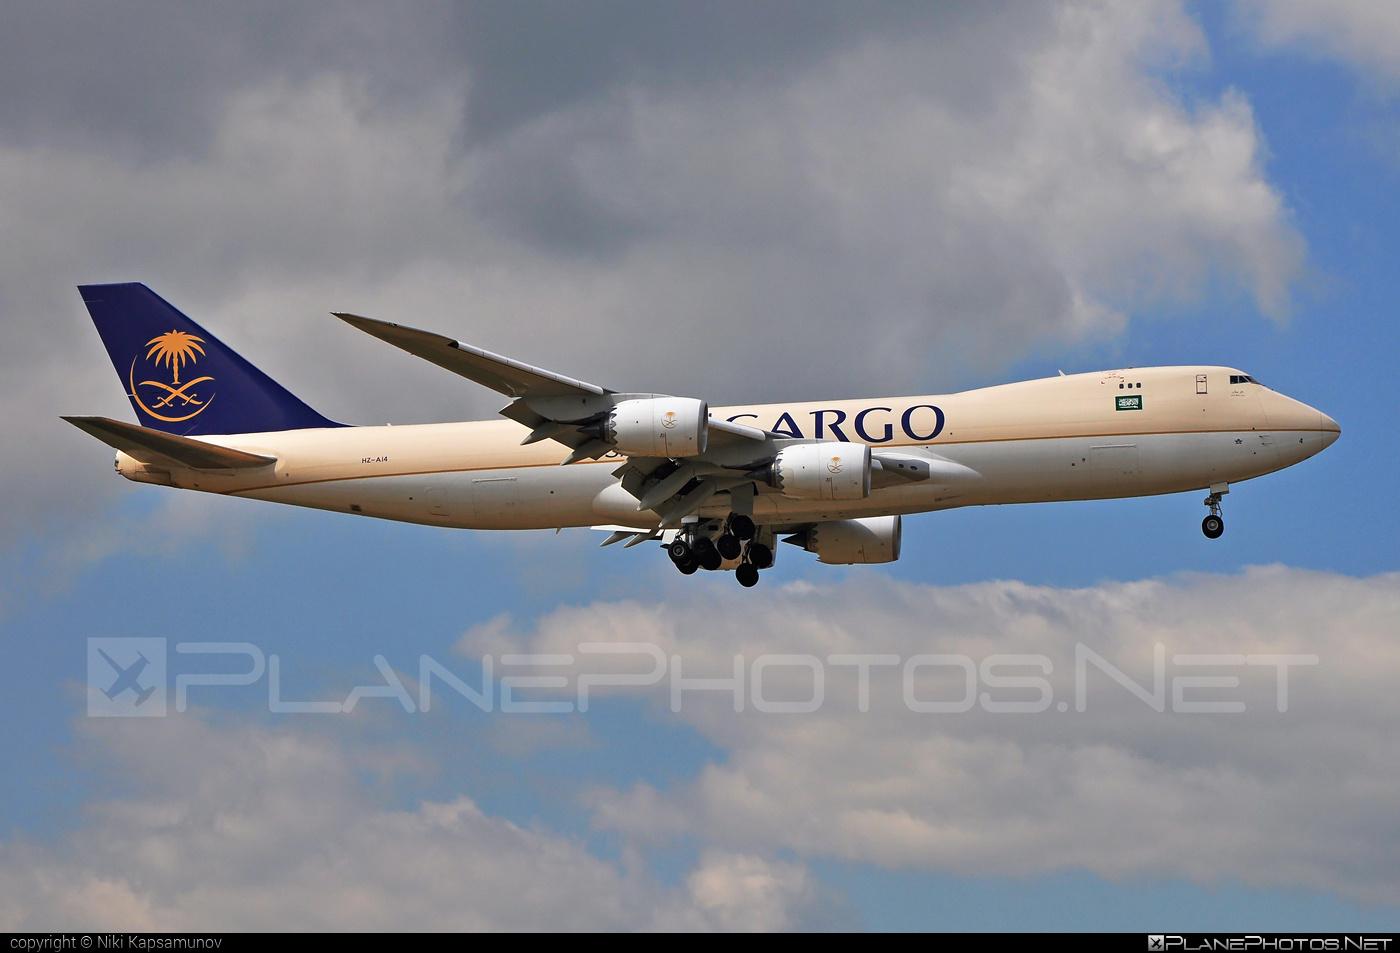 Saudi Arabian Airlines Cargo Boeing 747-8F - HZ-AI4 #b747 #b747f #b747freighter #boeing #boeing747 #jumbo